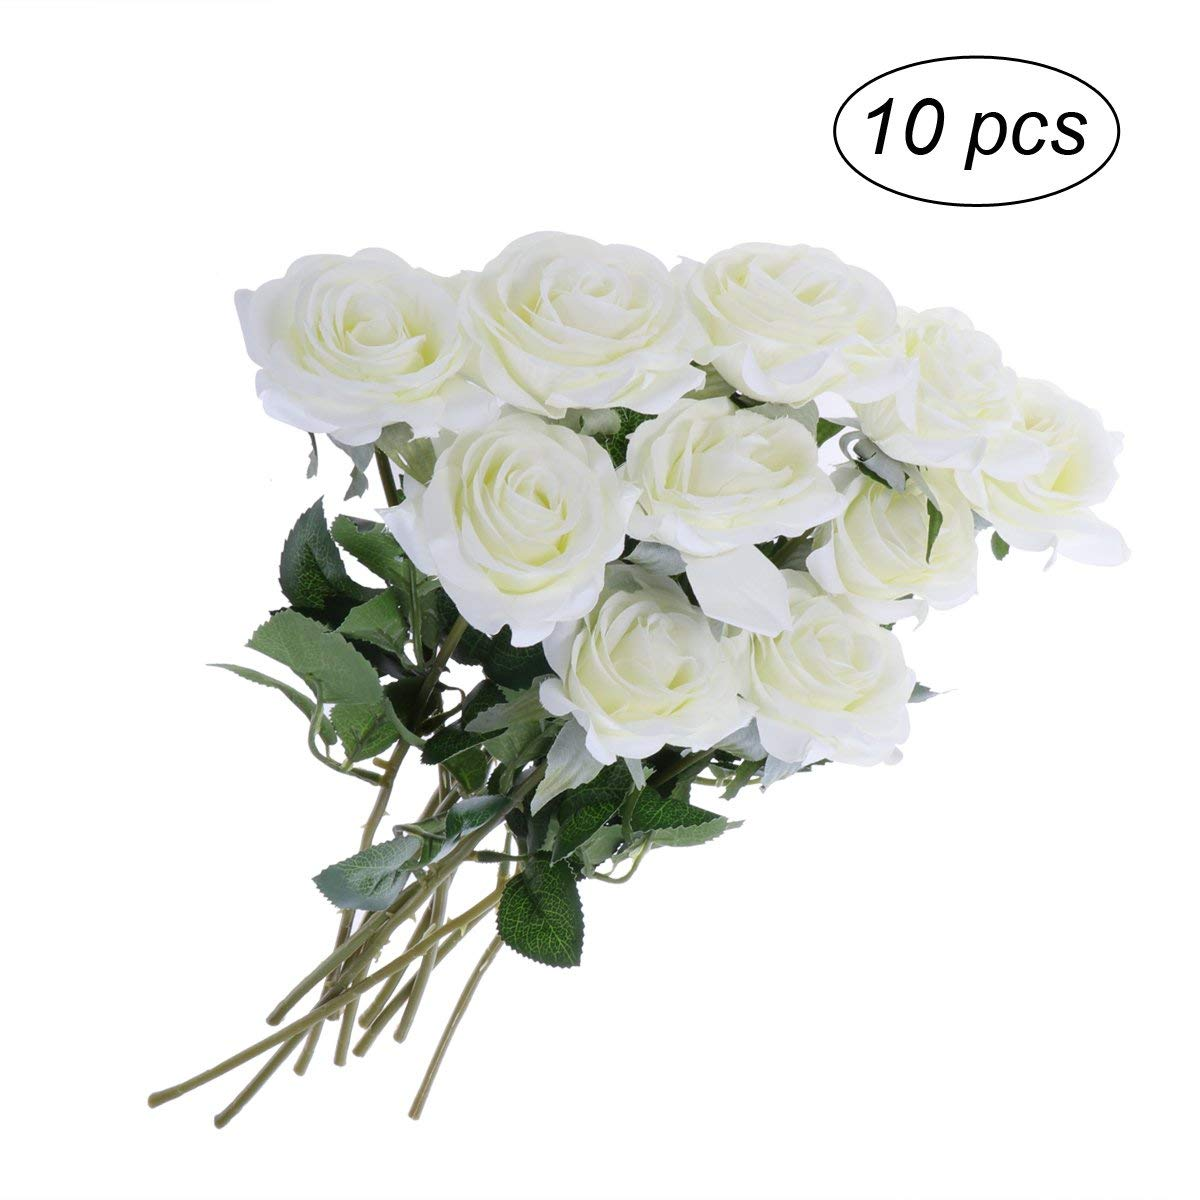 Cheap Long Stem White Flowers Find Long Stem White Flowers Deals On